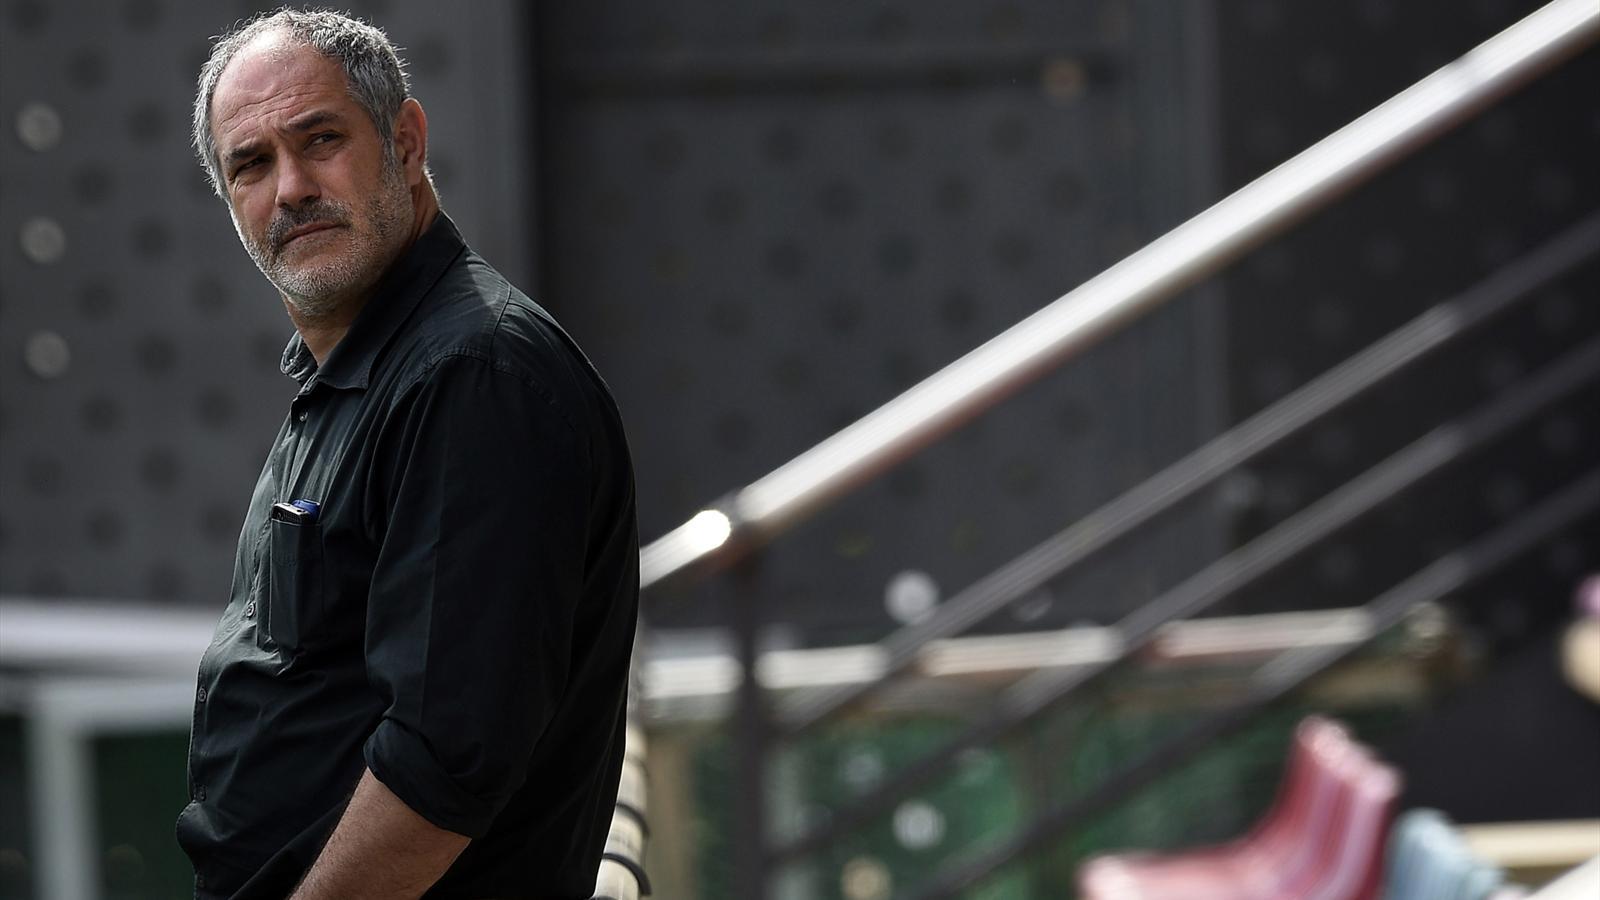 Liga : En crise, le FC Barcelone limoge Andoni Zubizarreta, son directeur sportif